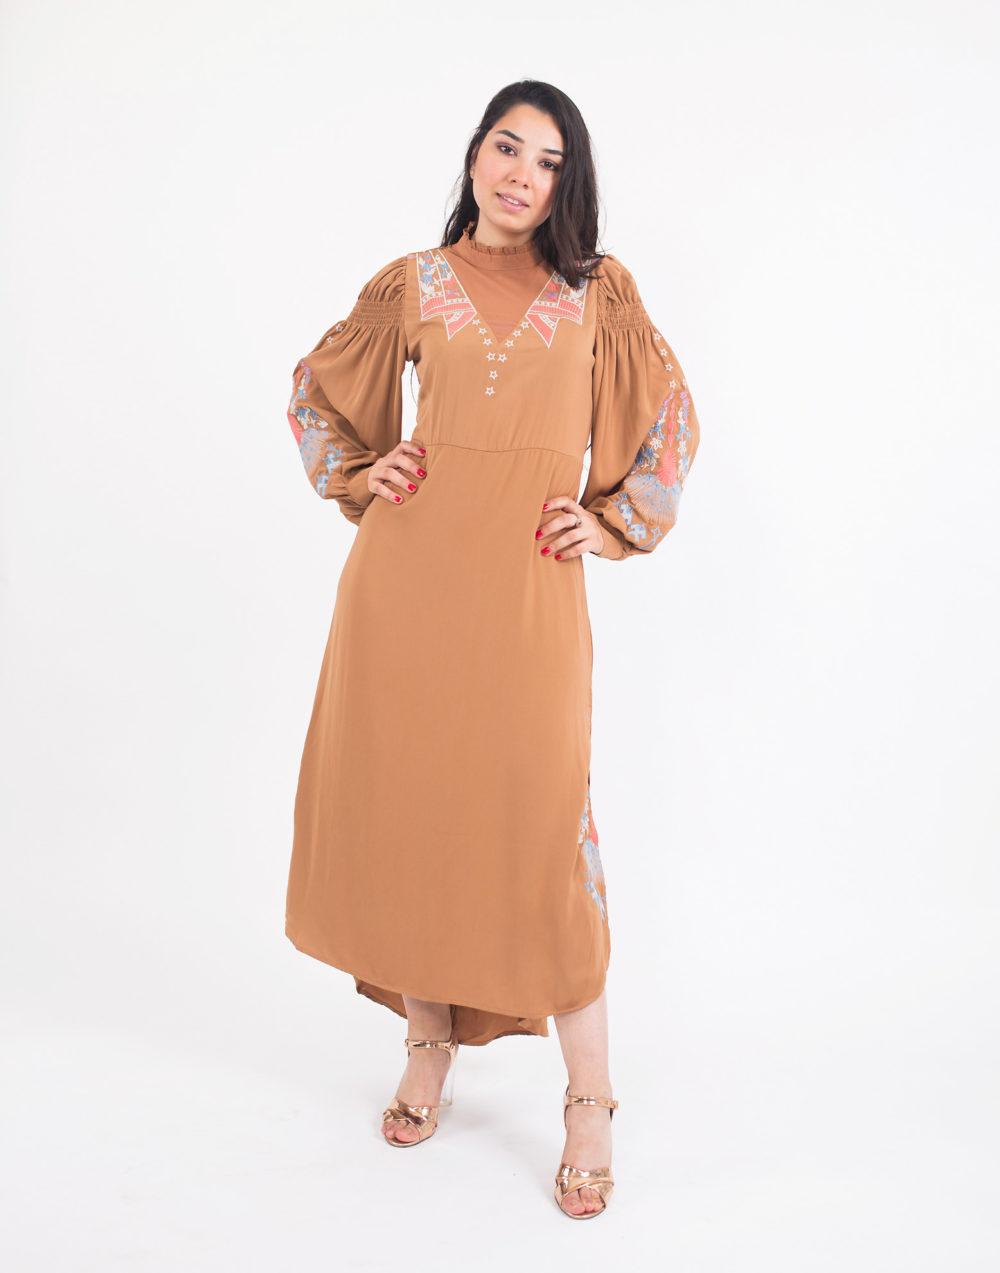 robe jour camel, brodÇ main 69